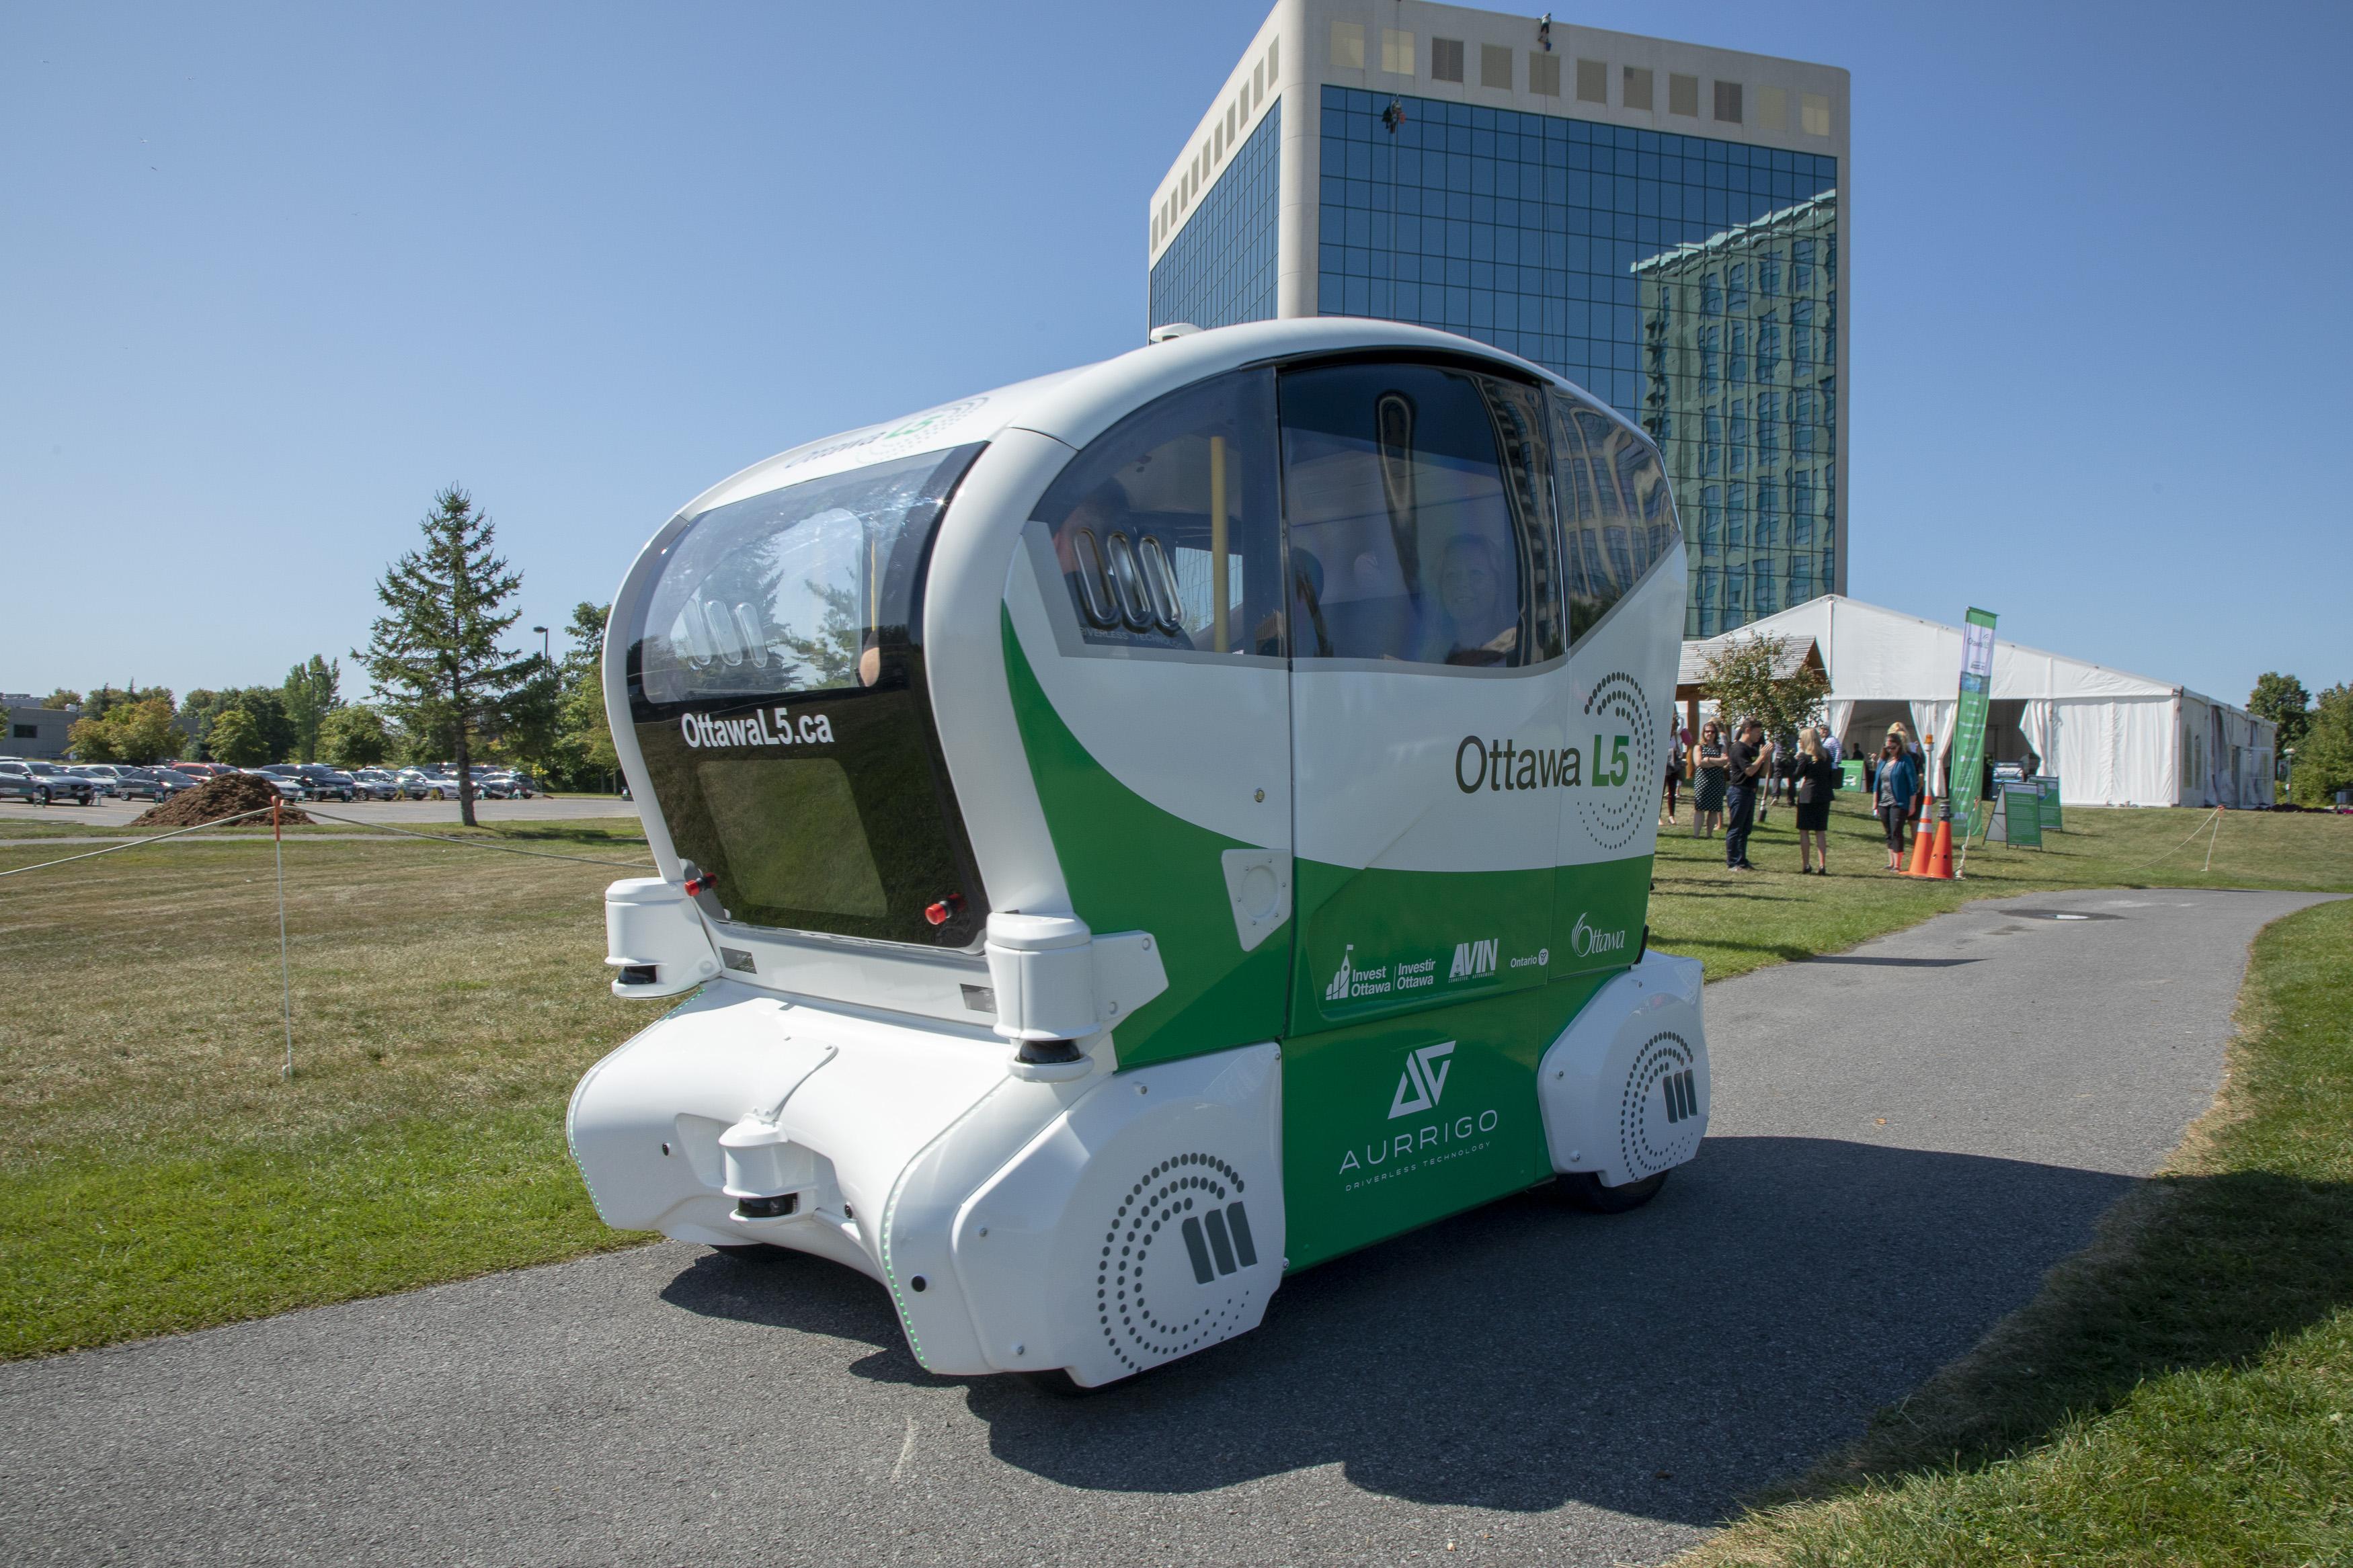 Going Autonomous On The Greens Kanata North Business Association